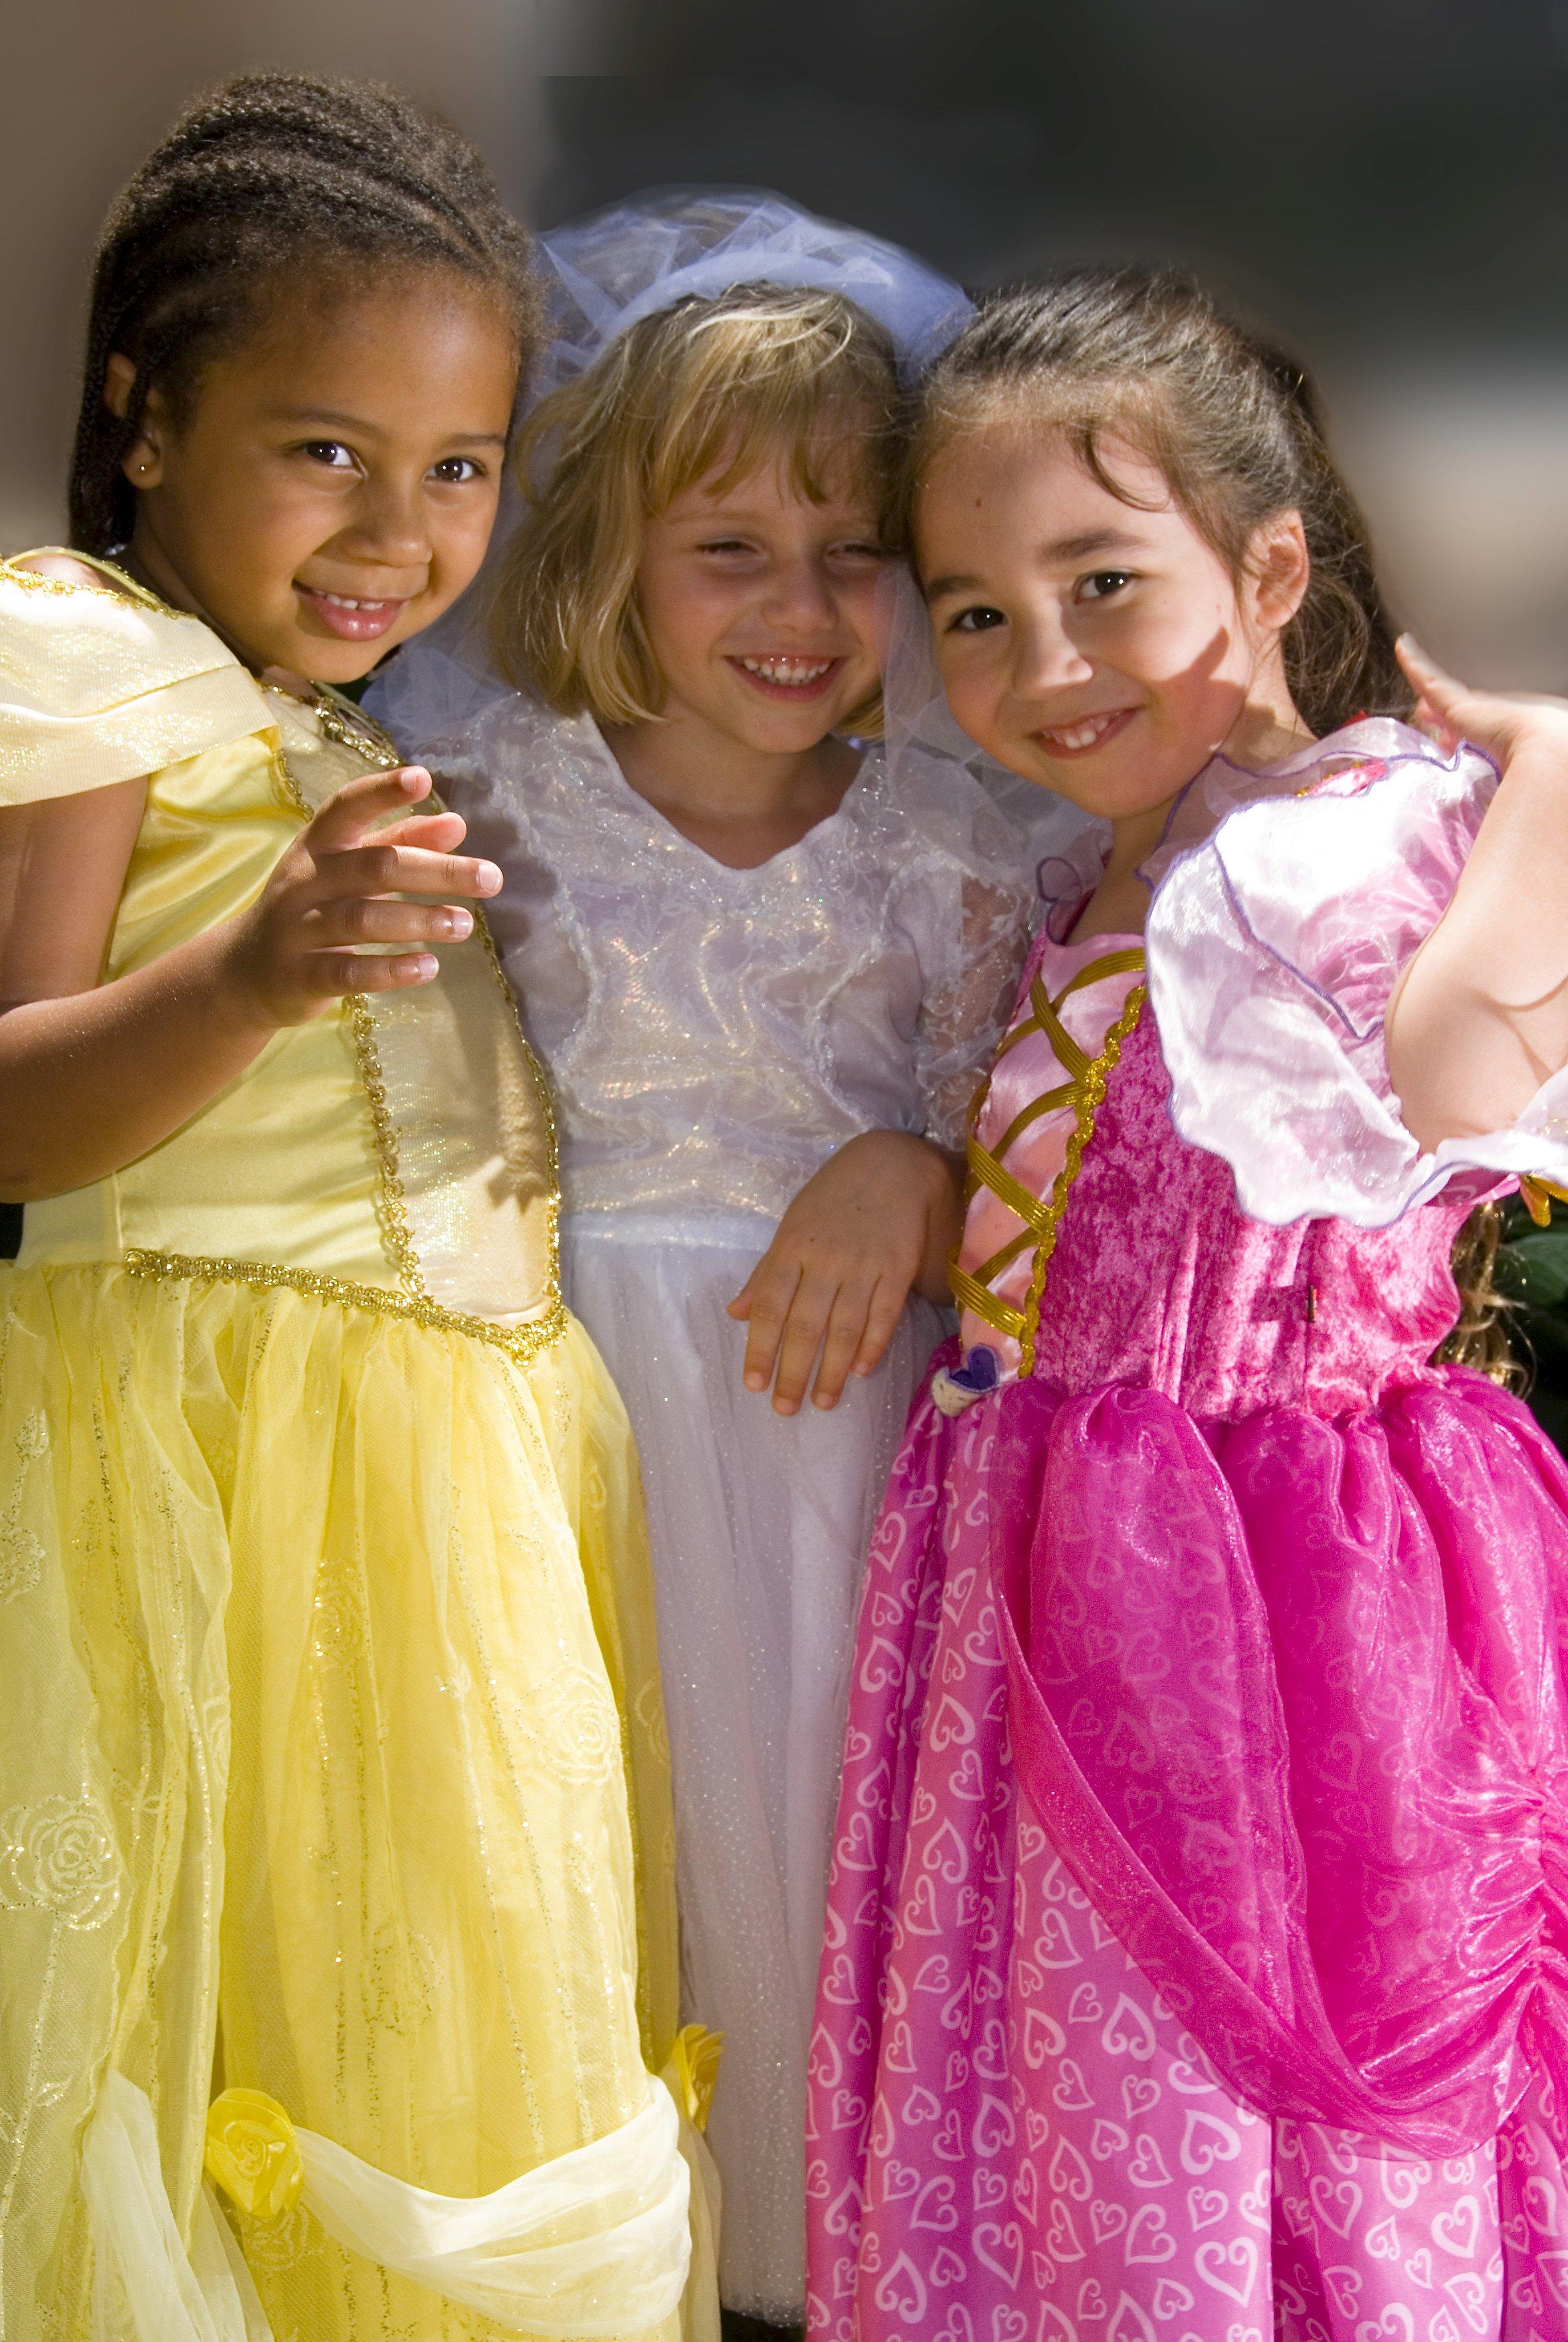 5 Disney Princess Party Ideas